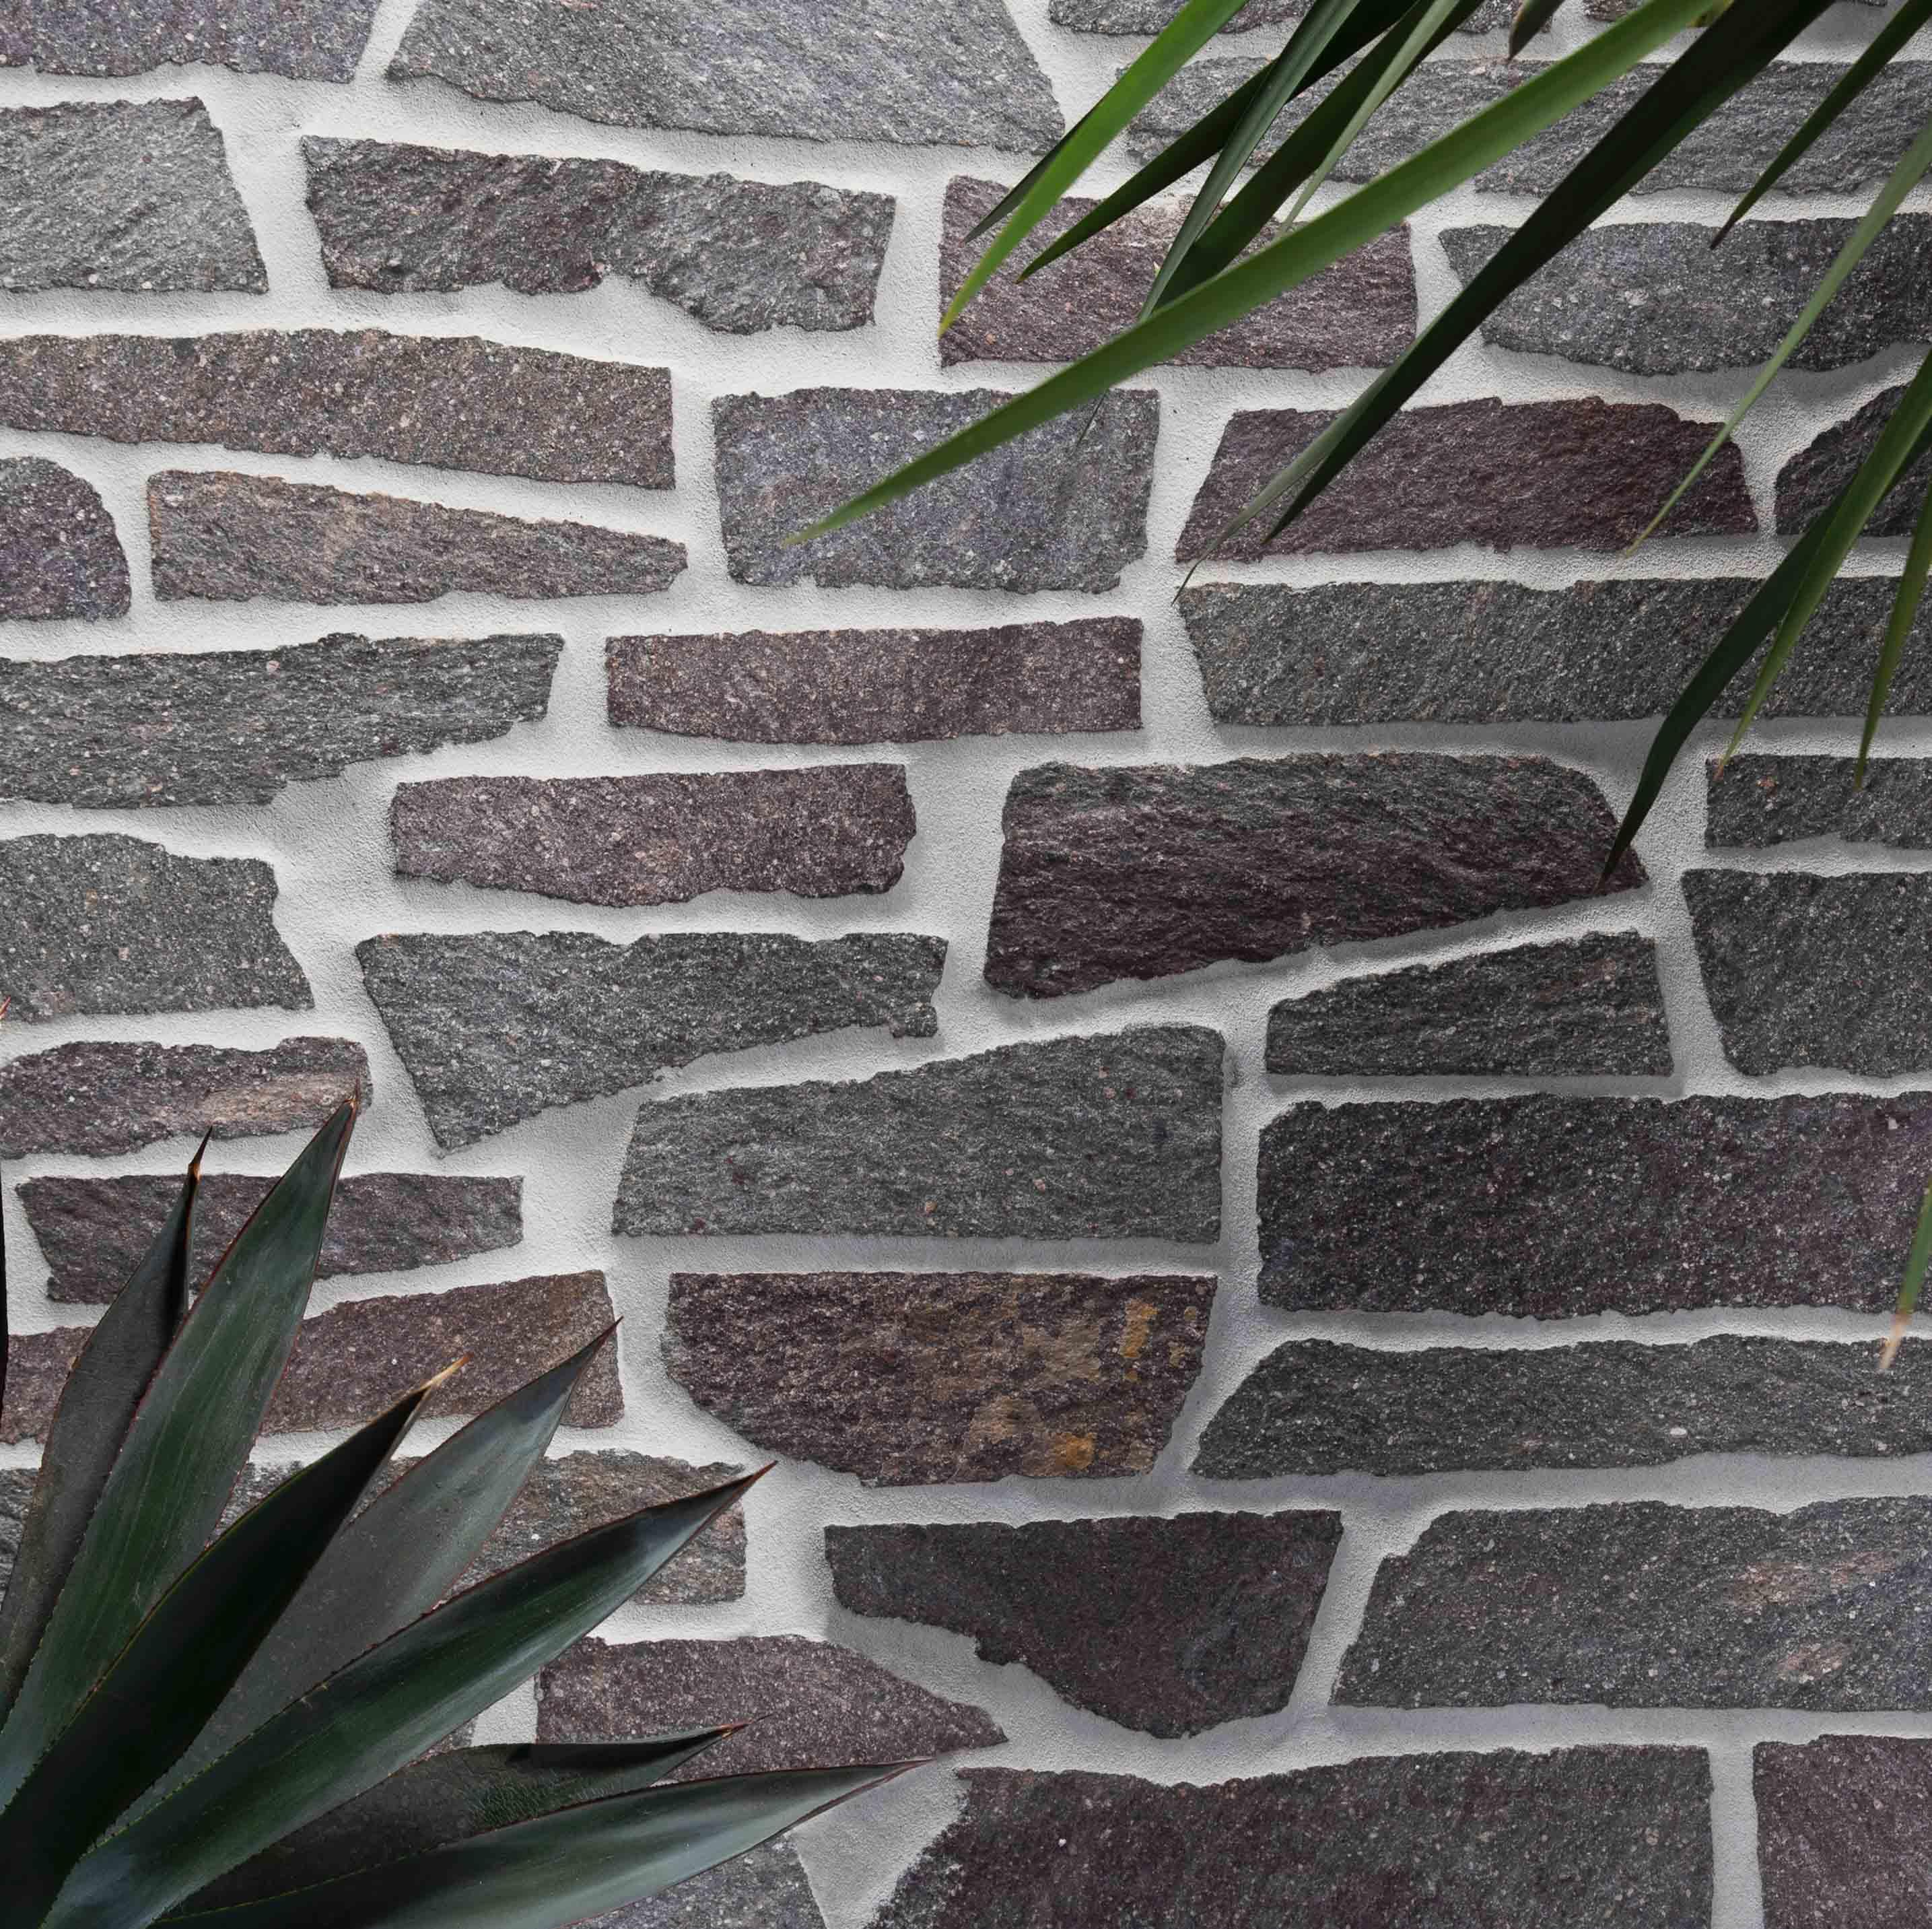 Cobblestones Hero porphyry-filetti-split-loose-cobblestones2